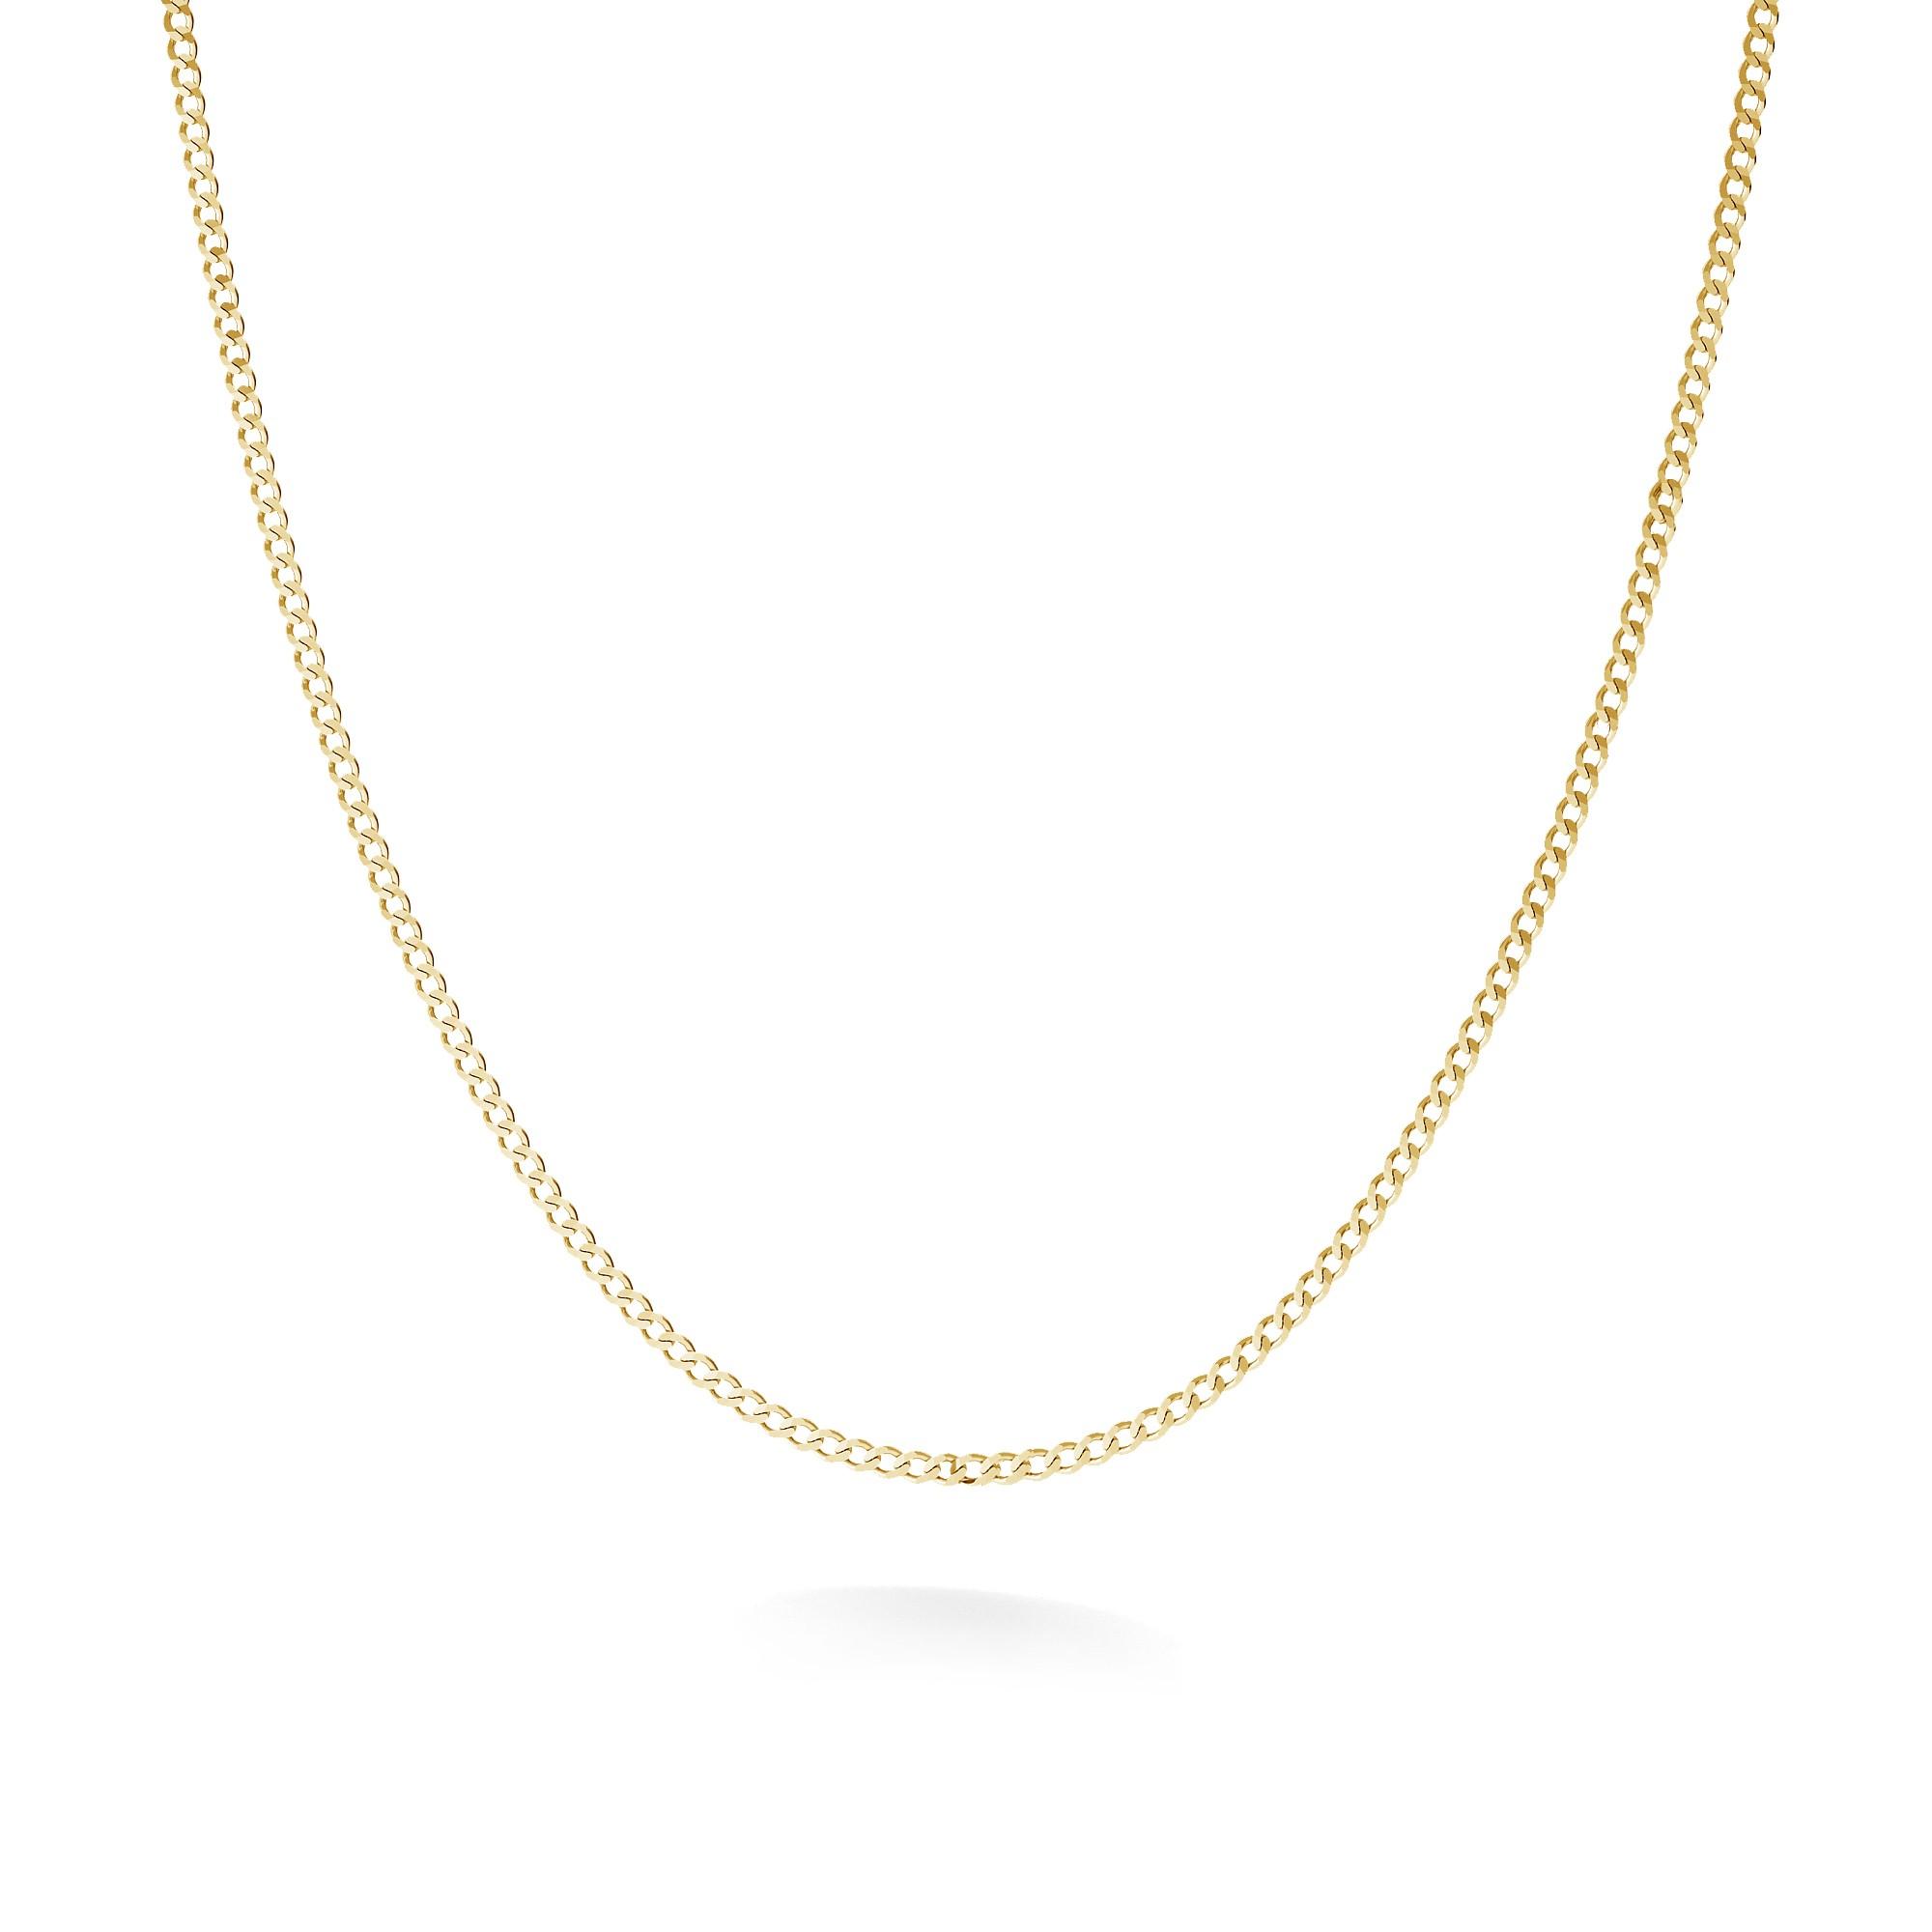 Cadena de plata 45-55 cm, plata chapada en rodio u oro, plata 925